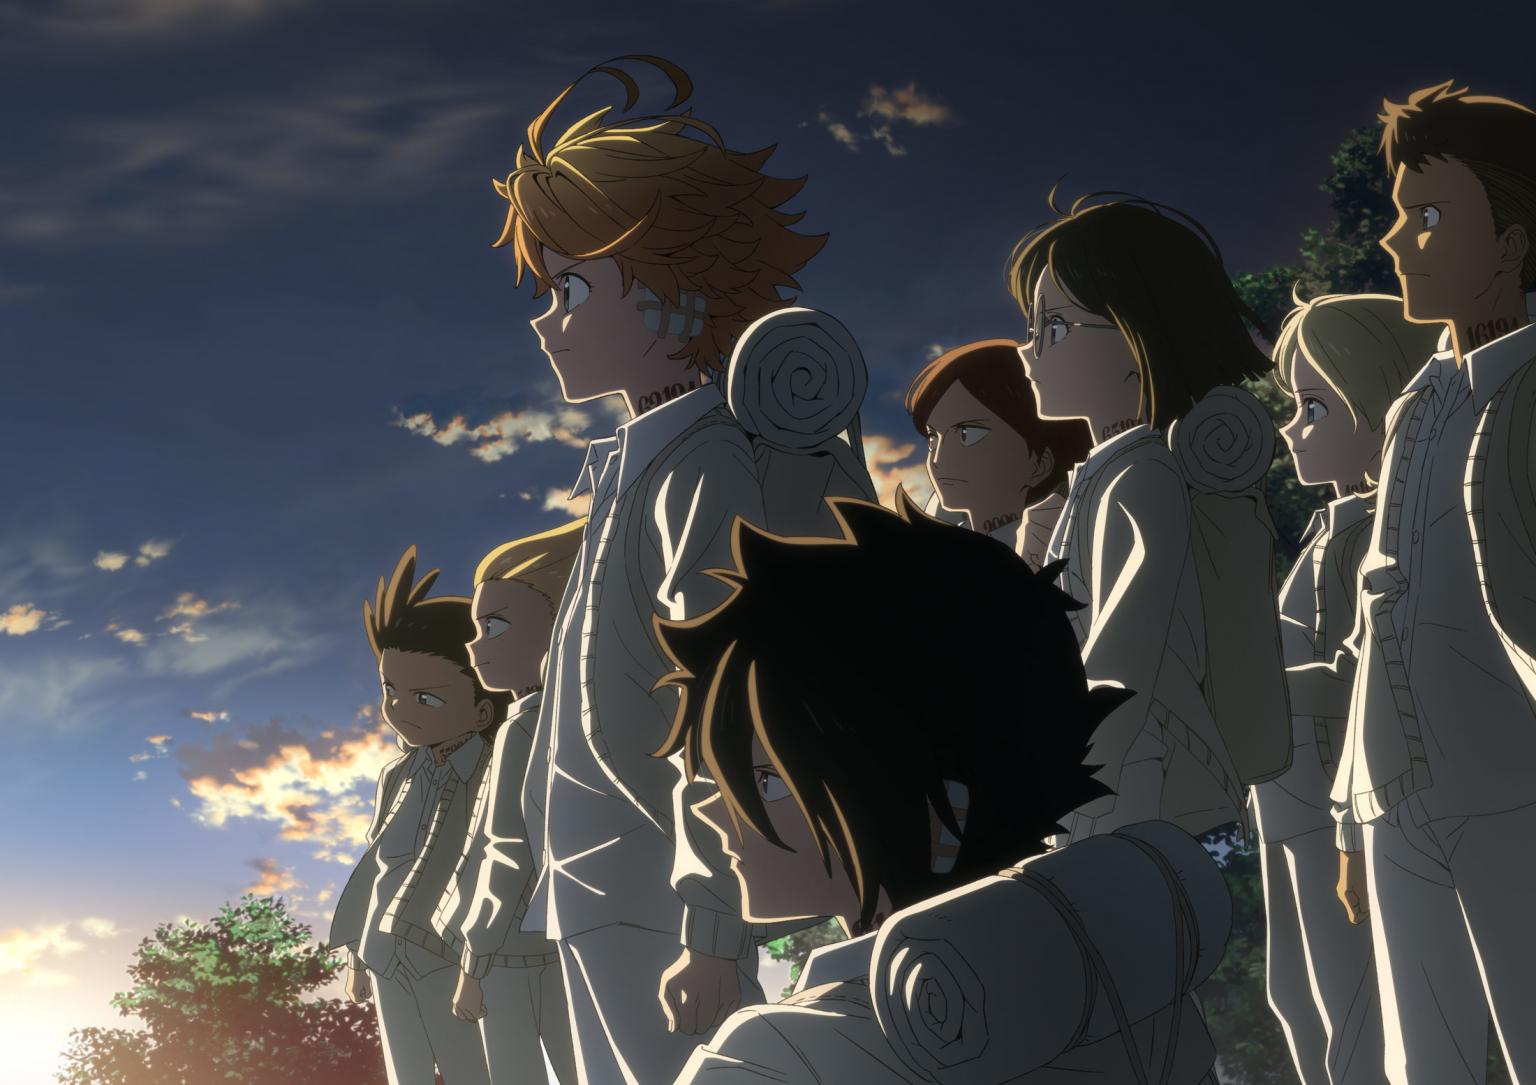 [NEWS] Une saison 2 pour The Promised Neverland The-Promised-Neverland-anime-image125-1536x1085